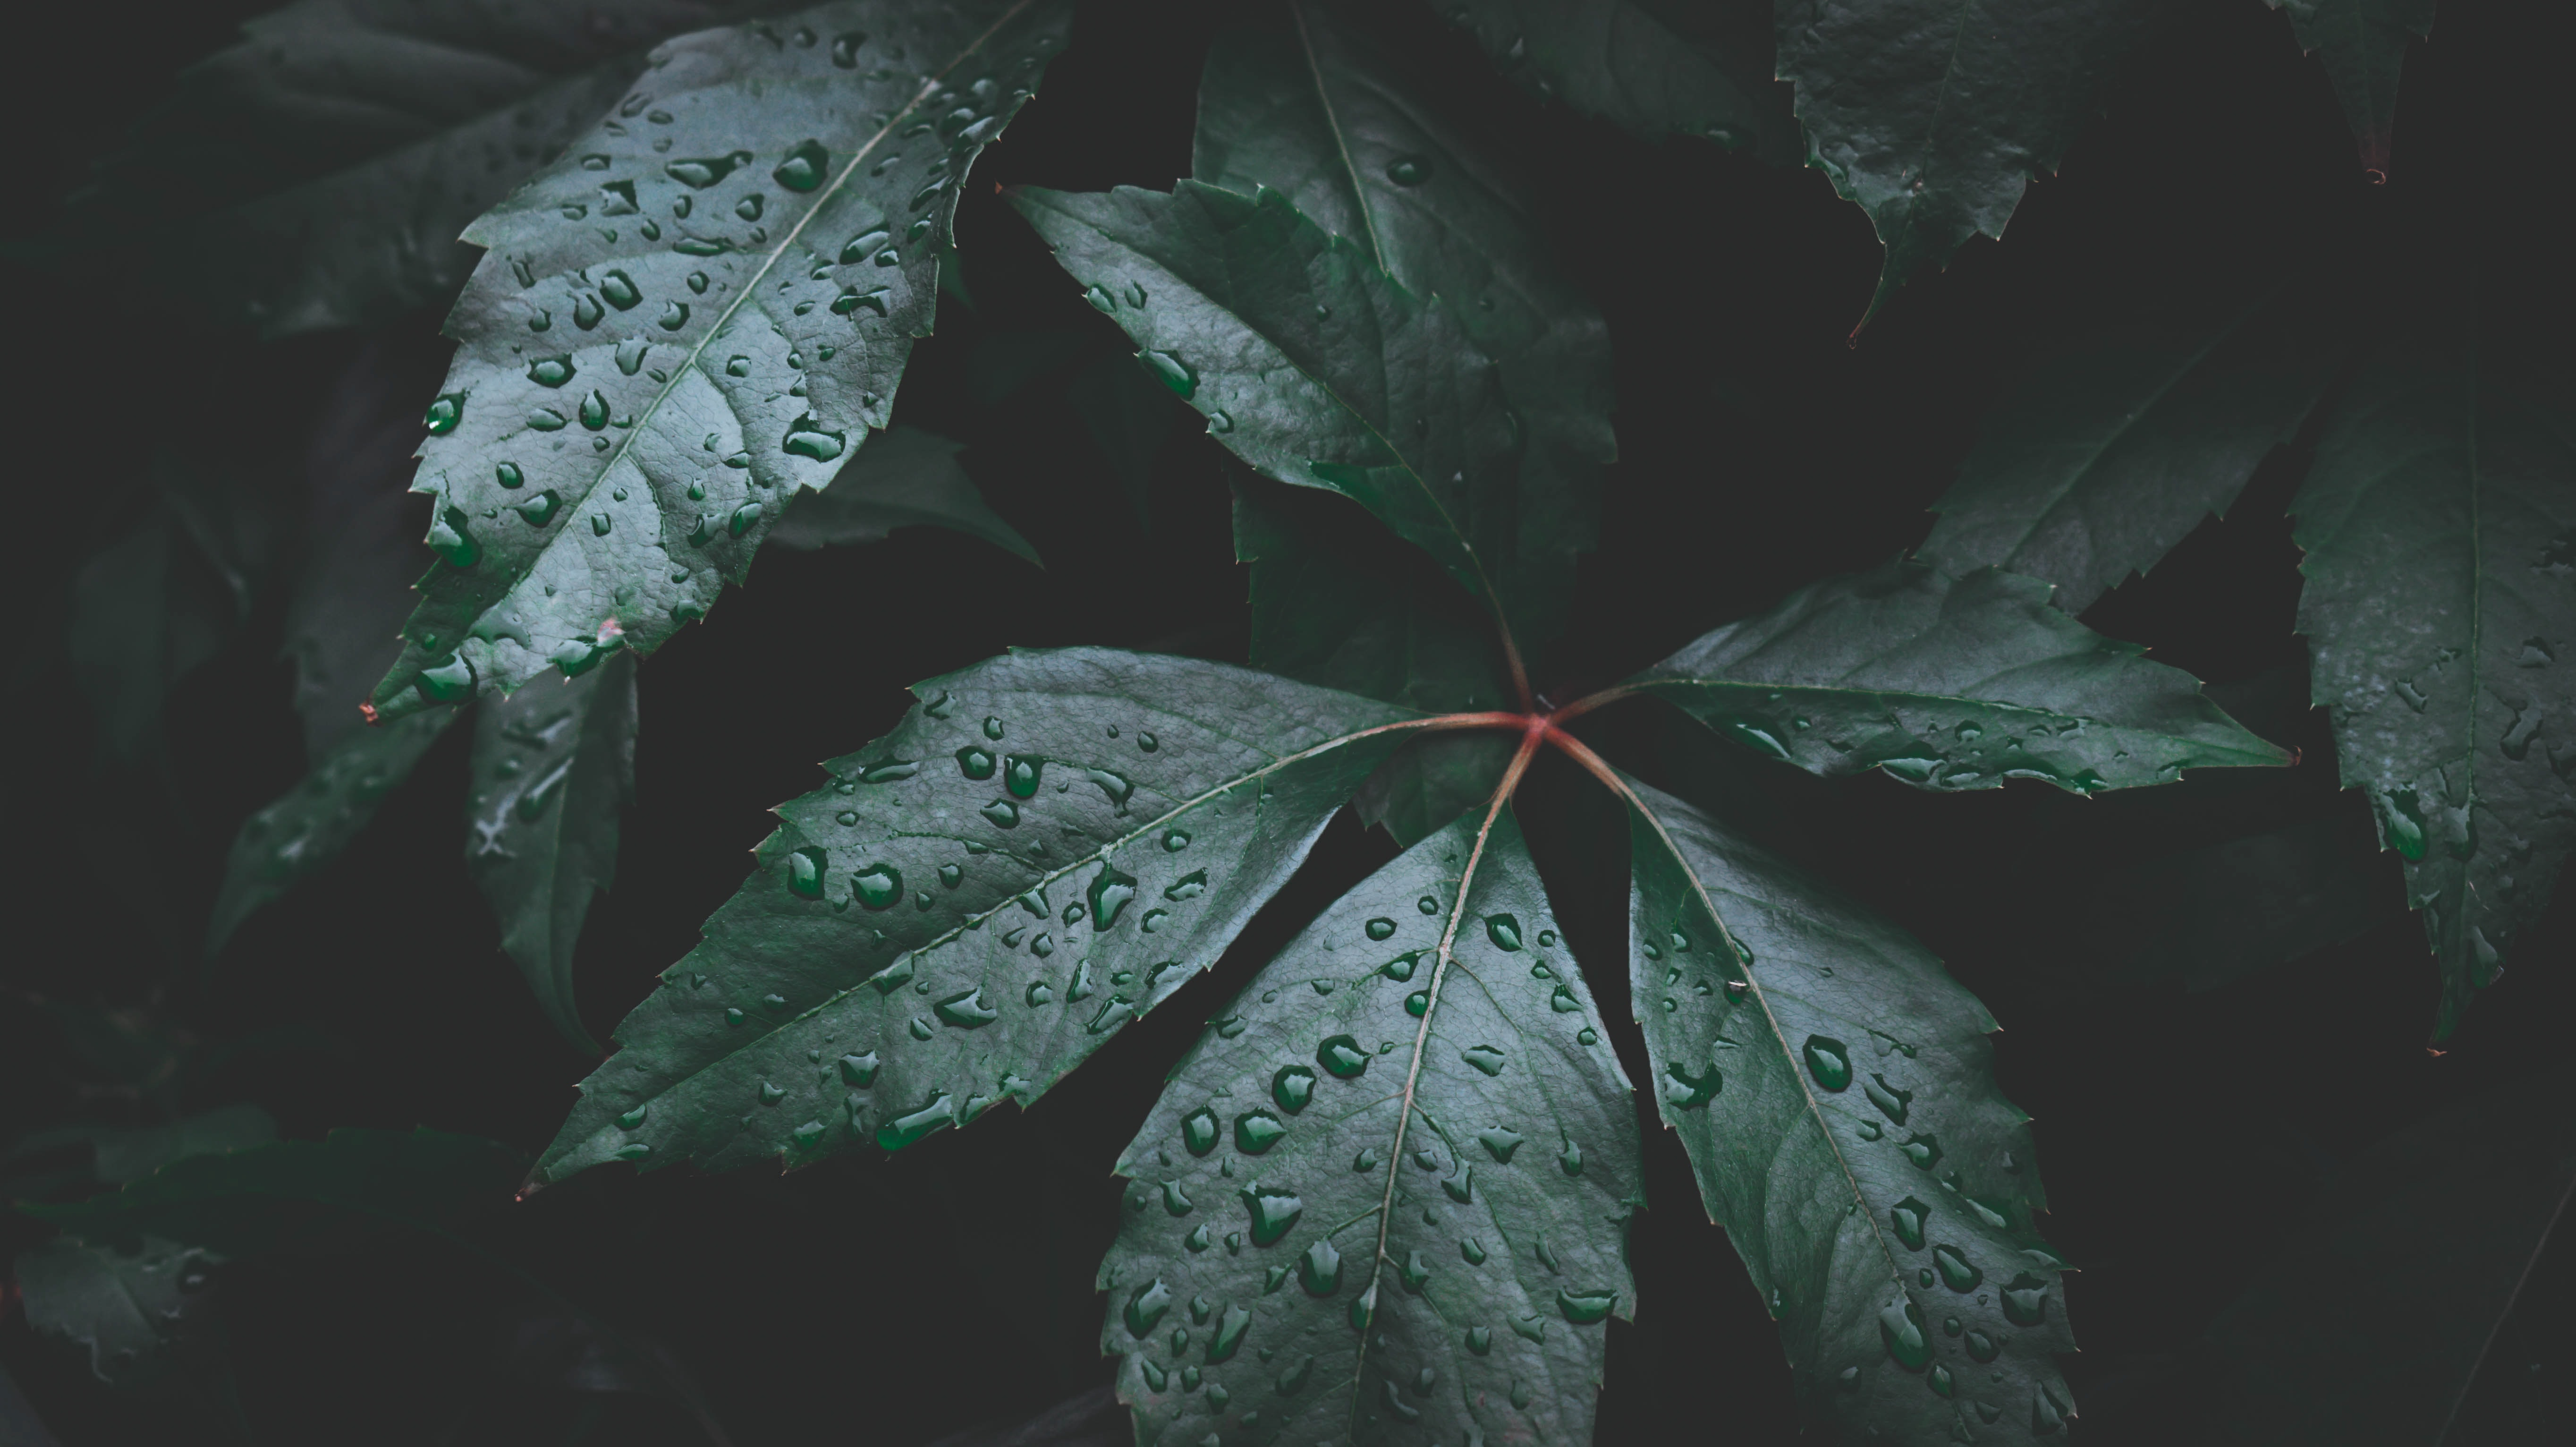 water dew on green leaf plant